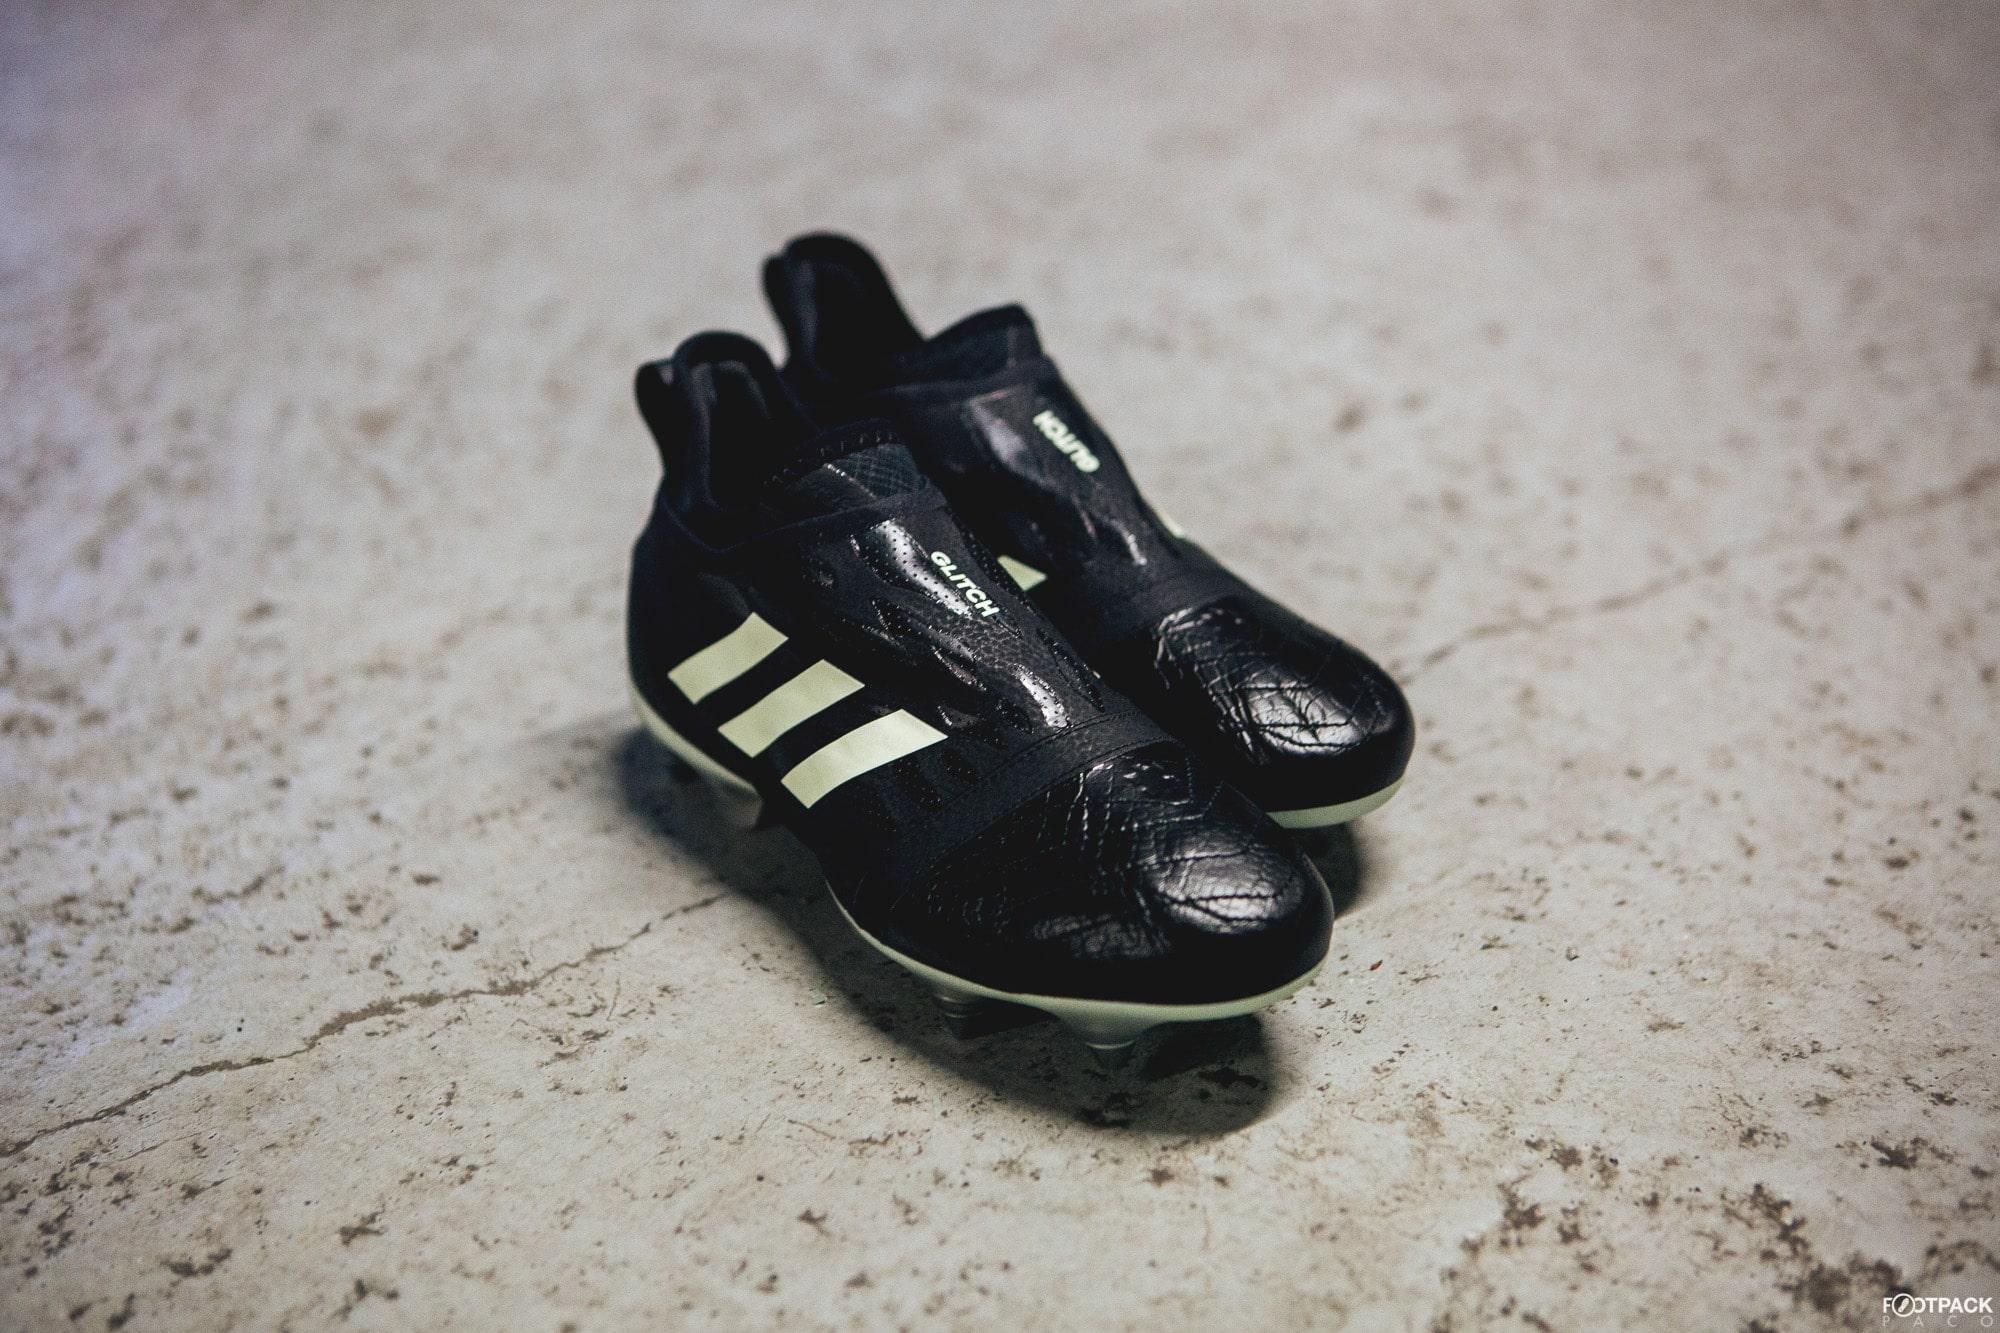 chaussure-football-adidas-football-glitch-noctornal-janvier-2018-7